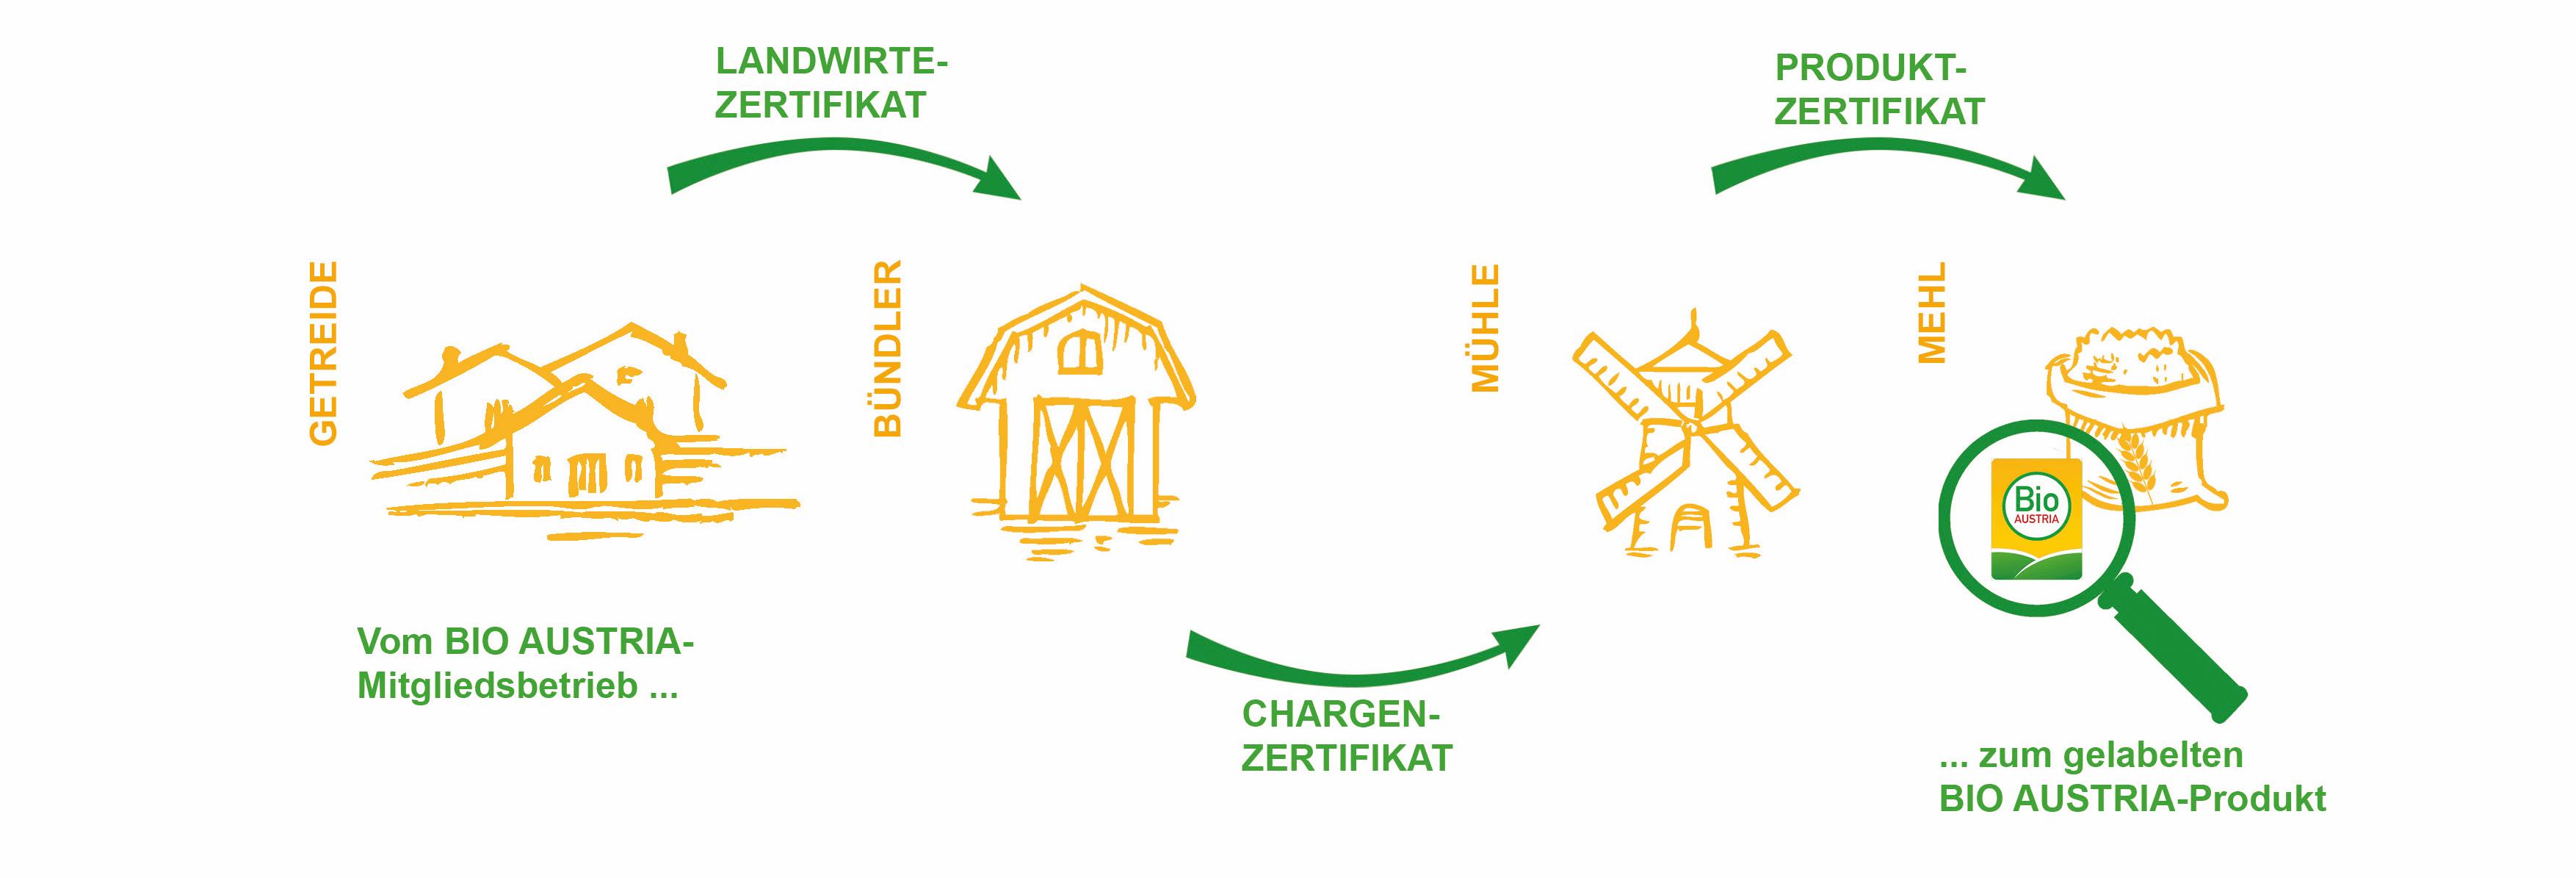 Marketing GmbH   BIO AUSTRIA